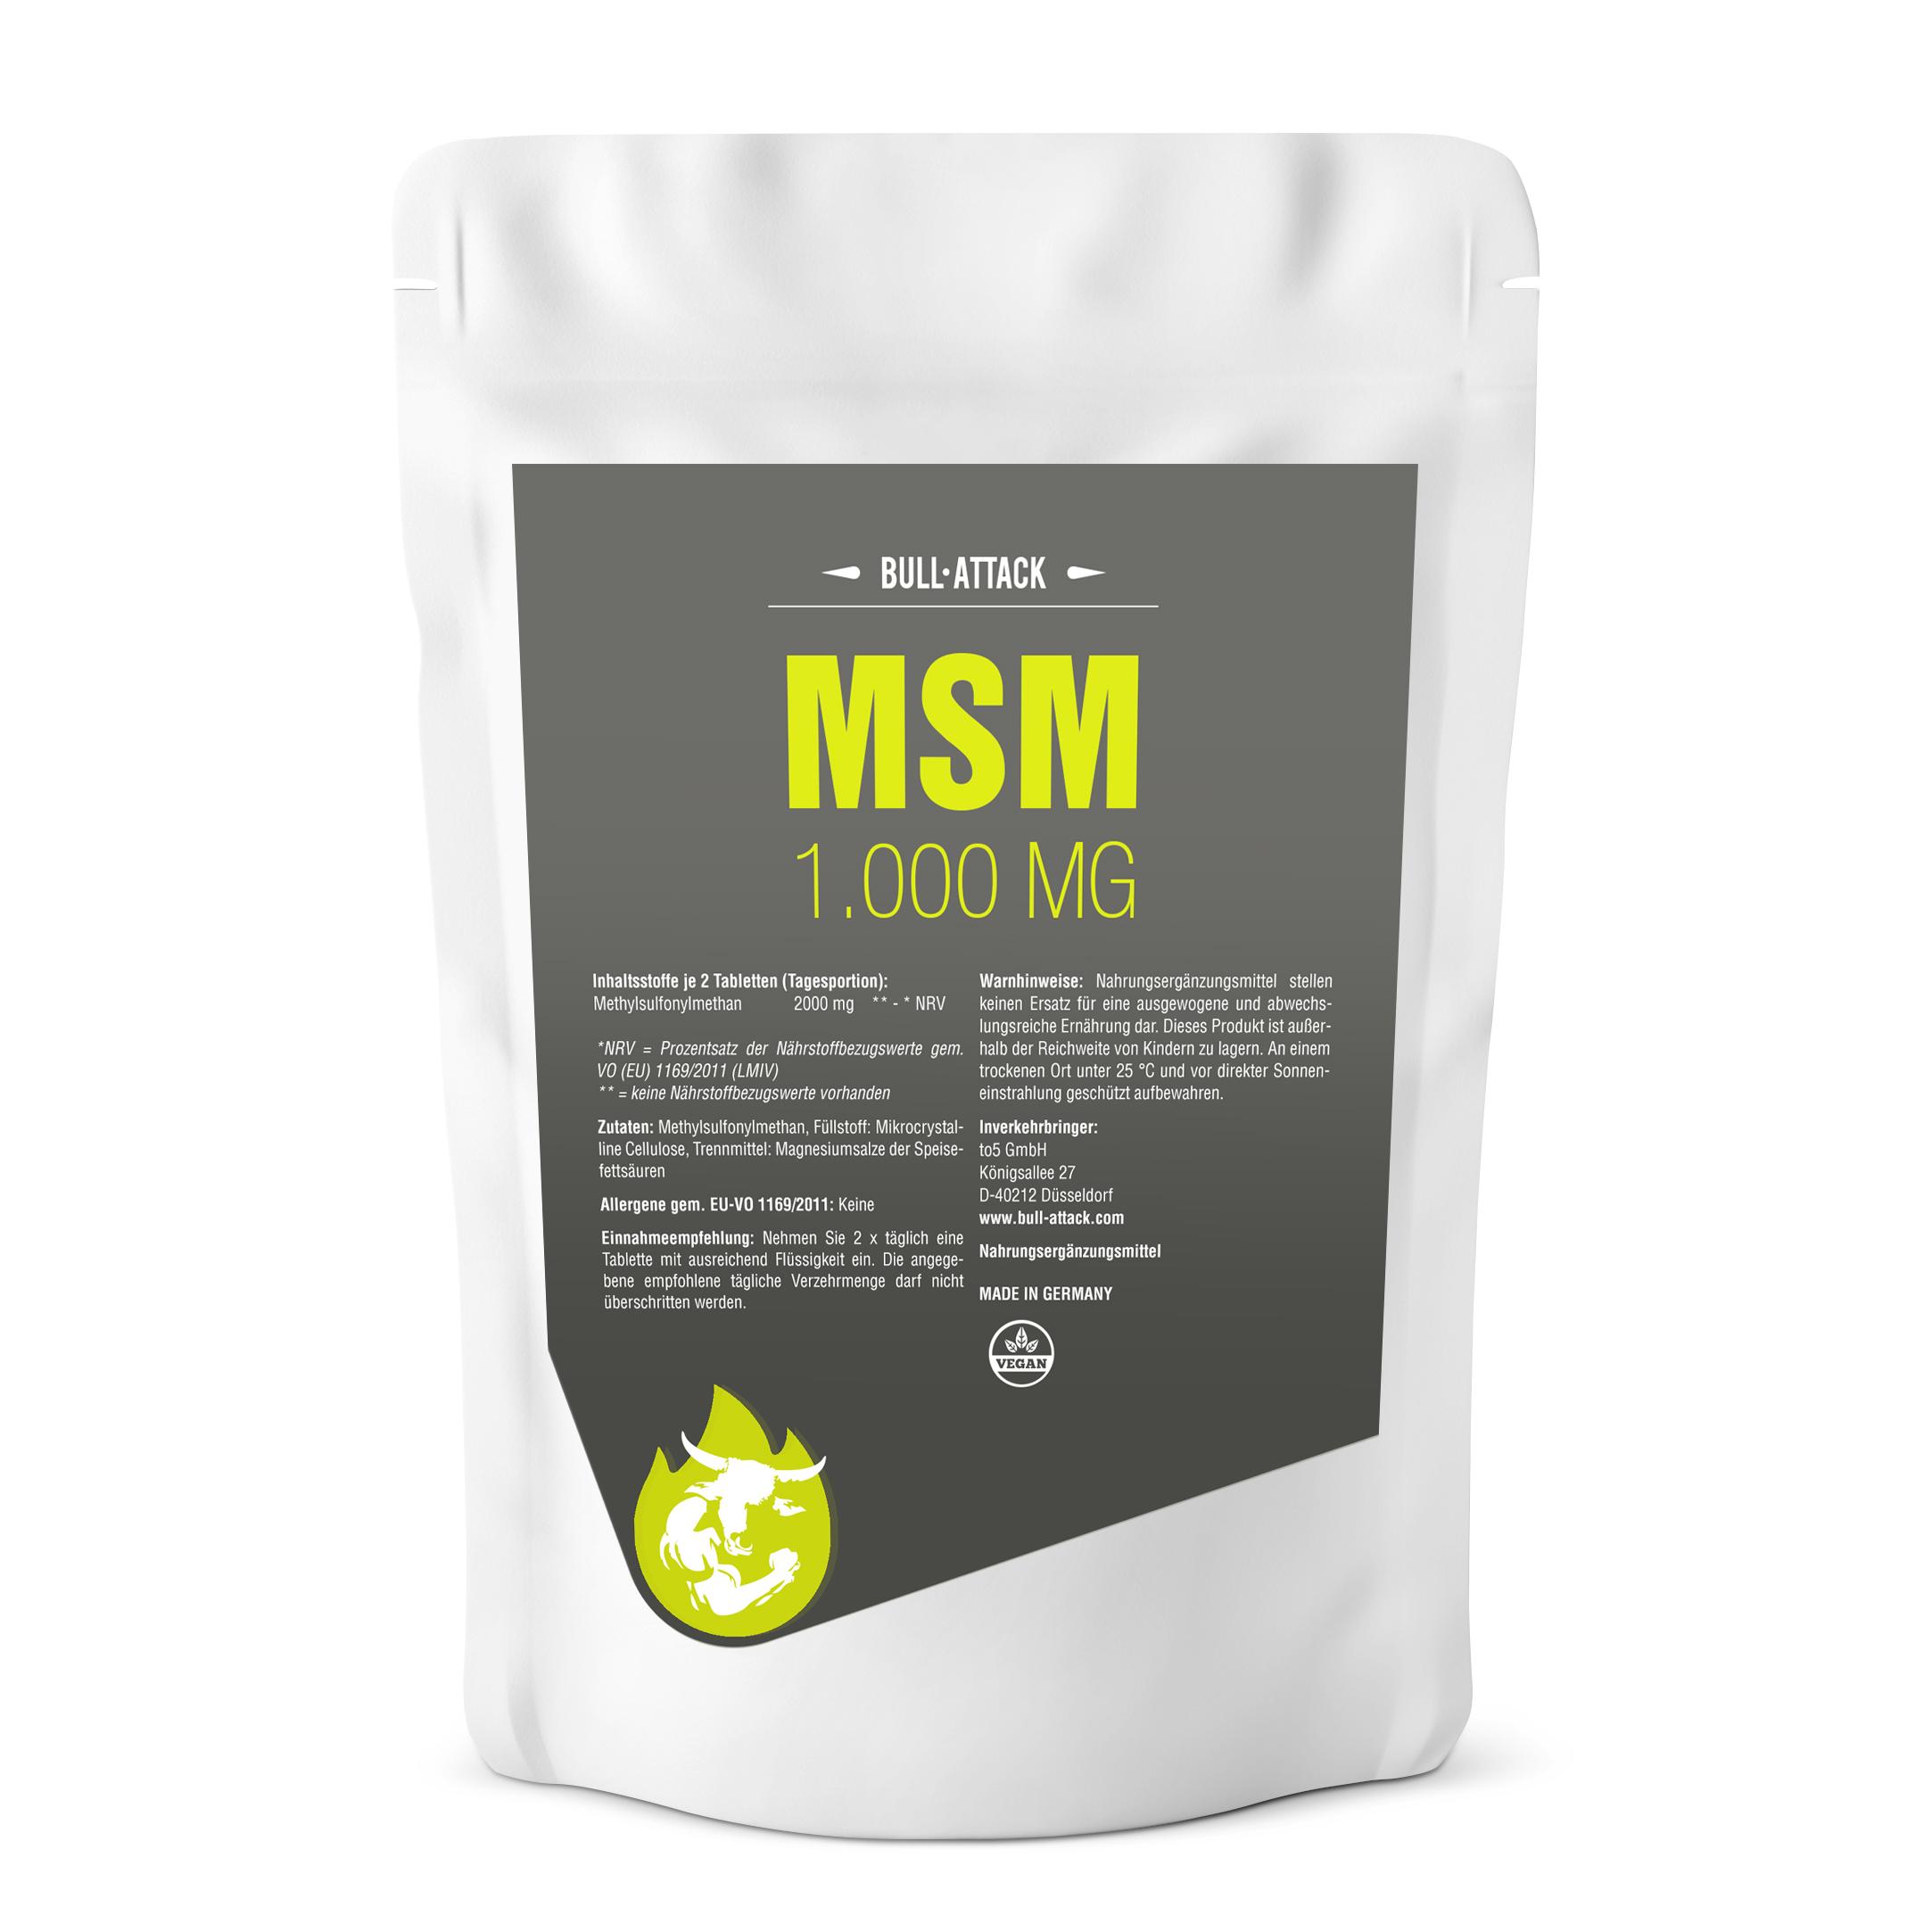 MSM Tabletten á 1000mg - Vegane, hochdosierte Tabletten